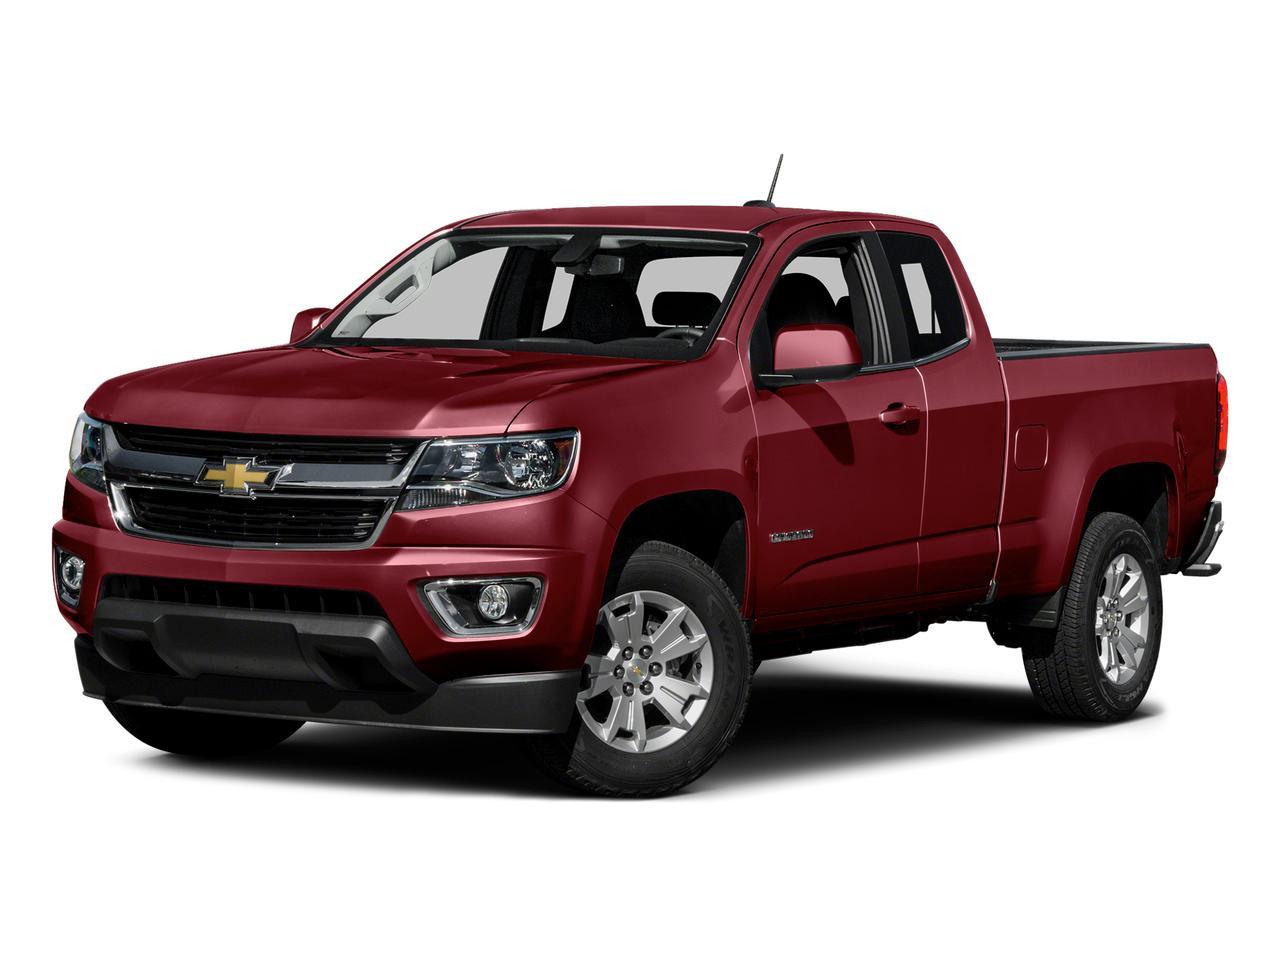 2015 Chevrolet Colorado Vehicle Photo in Paramus, NJ 07652